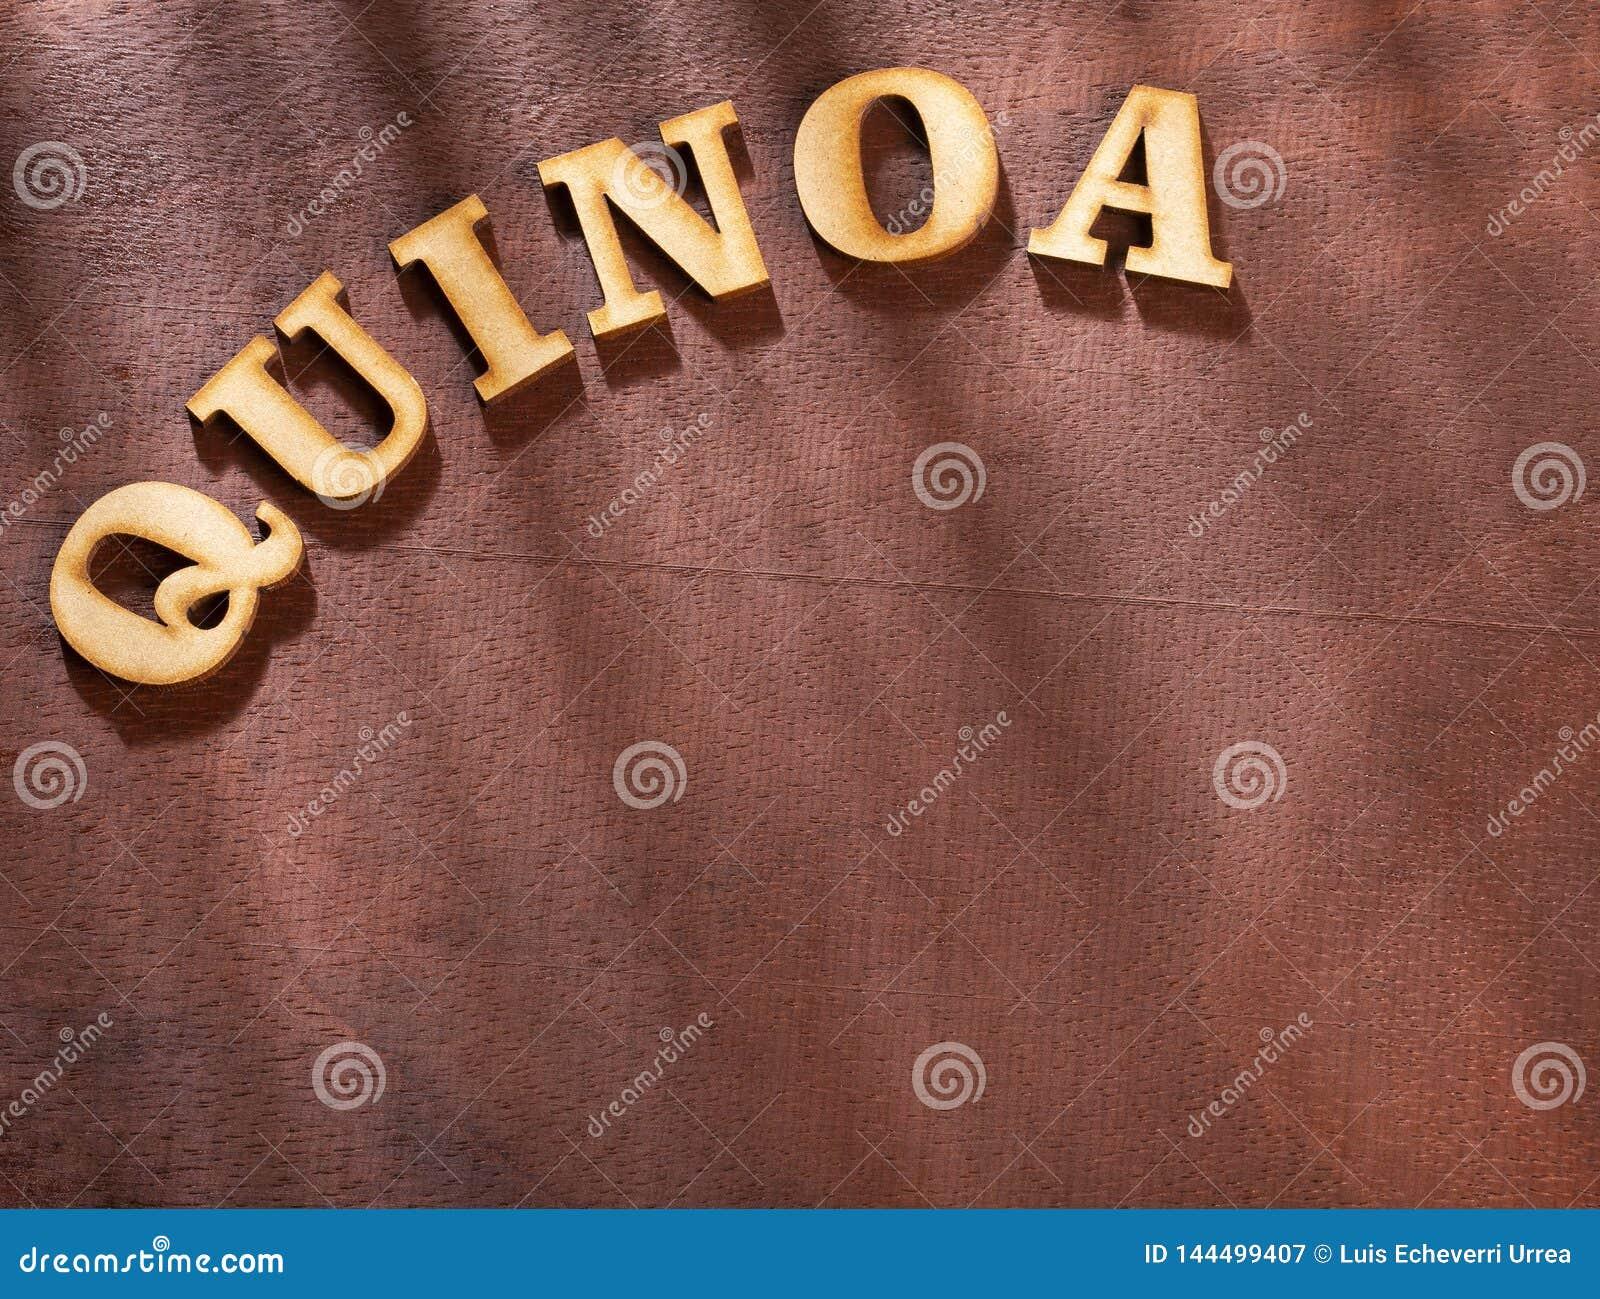 The word quinoa in wooden letters - Chenopodium quinoa. Text space